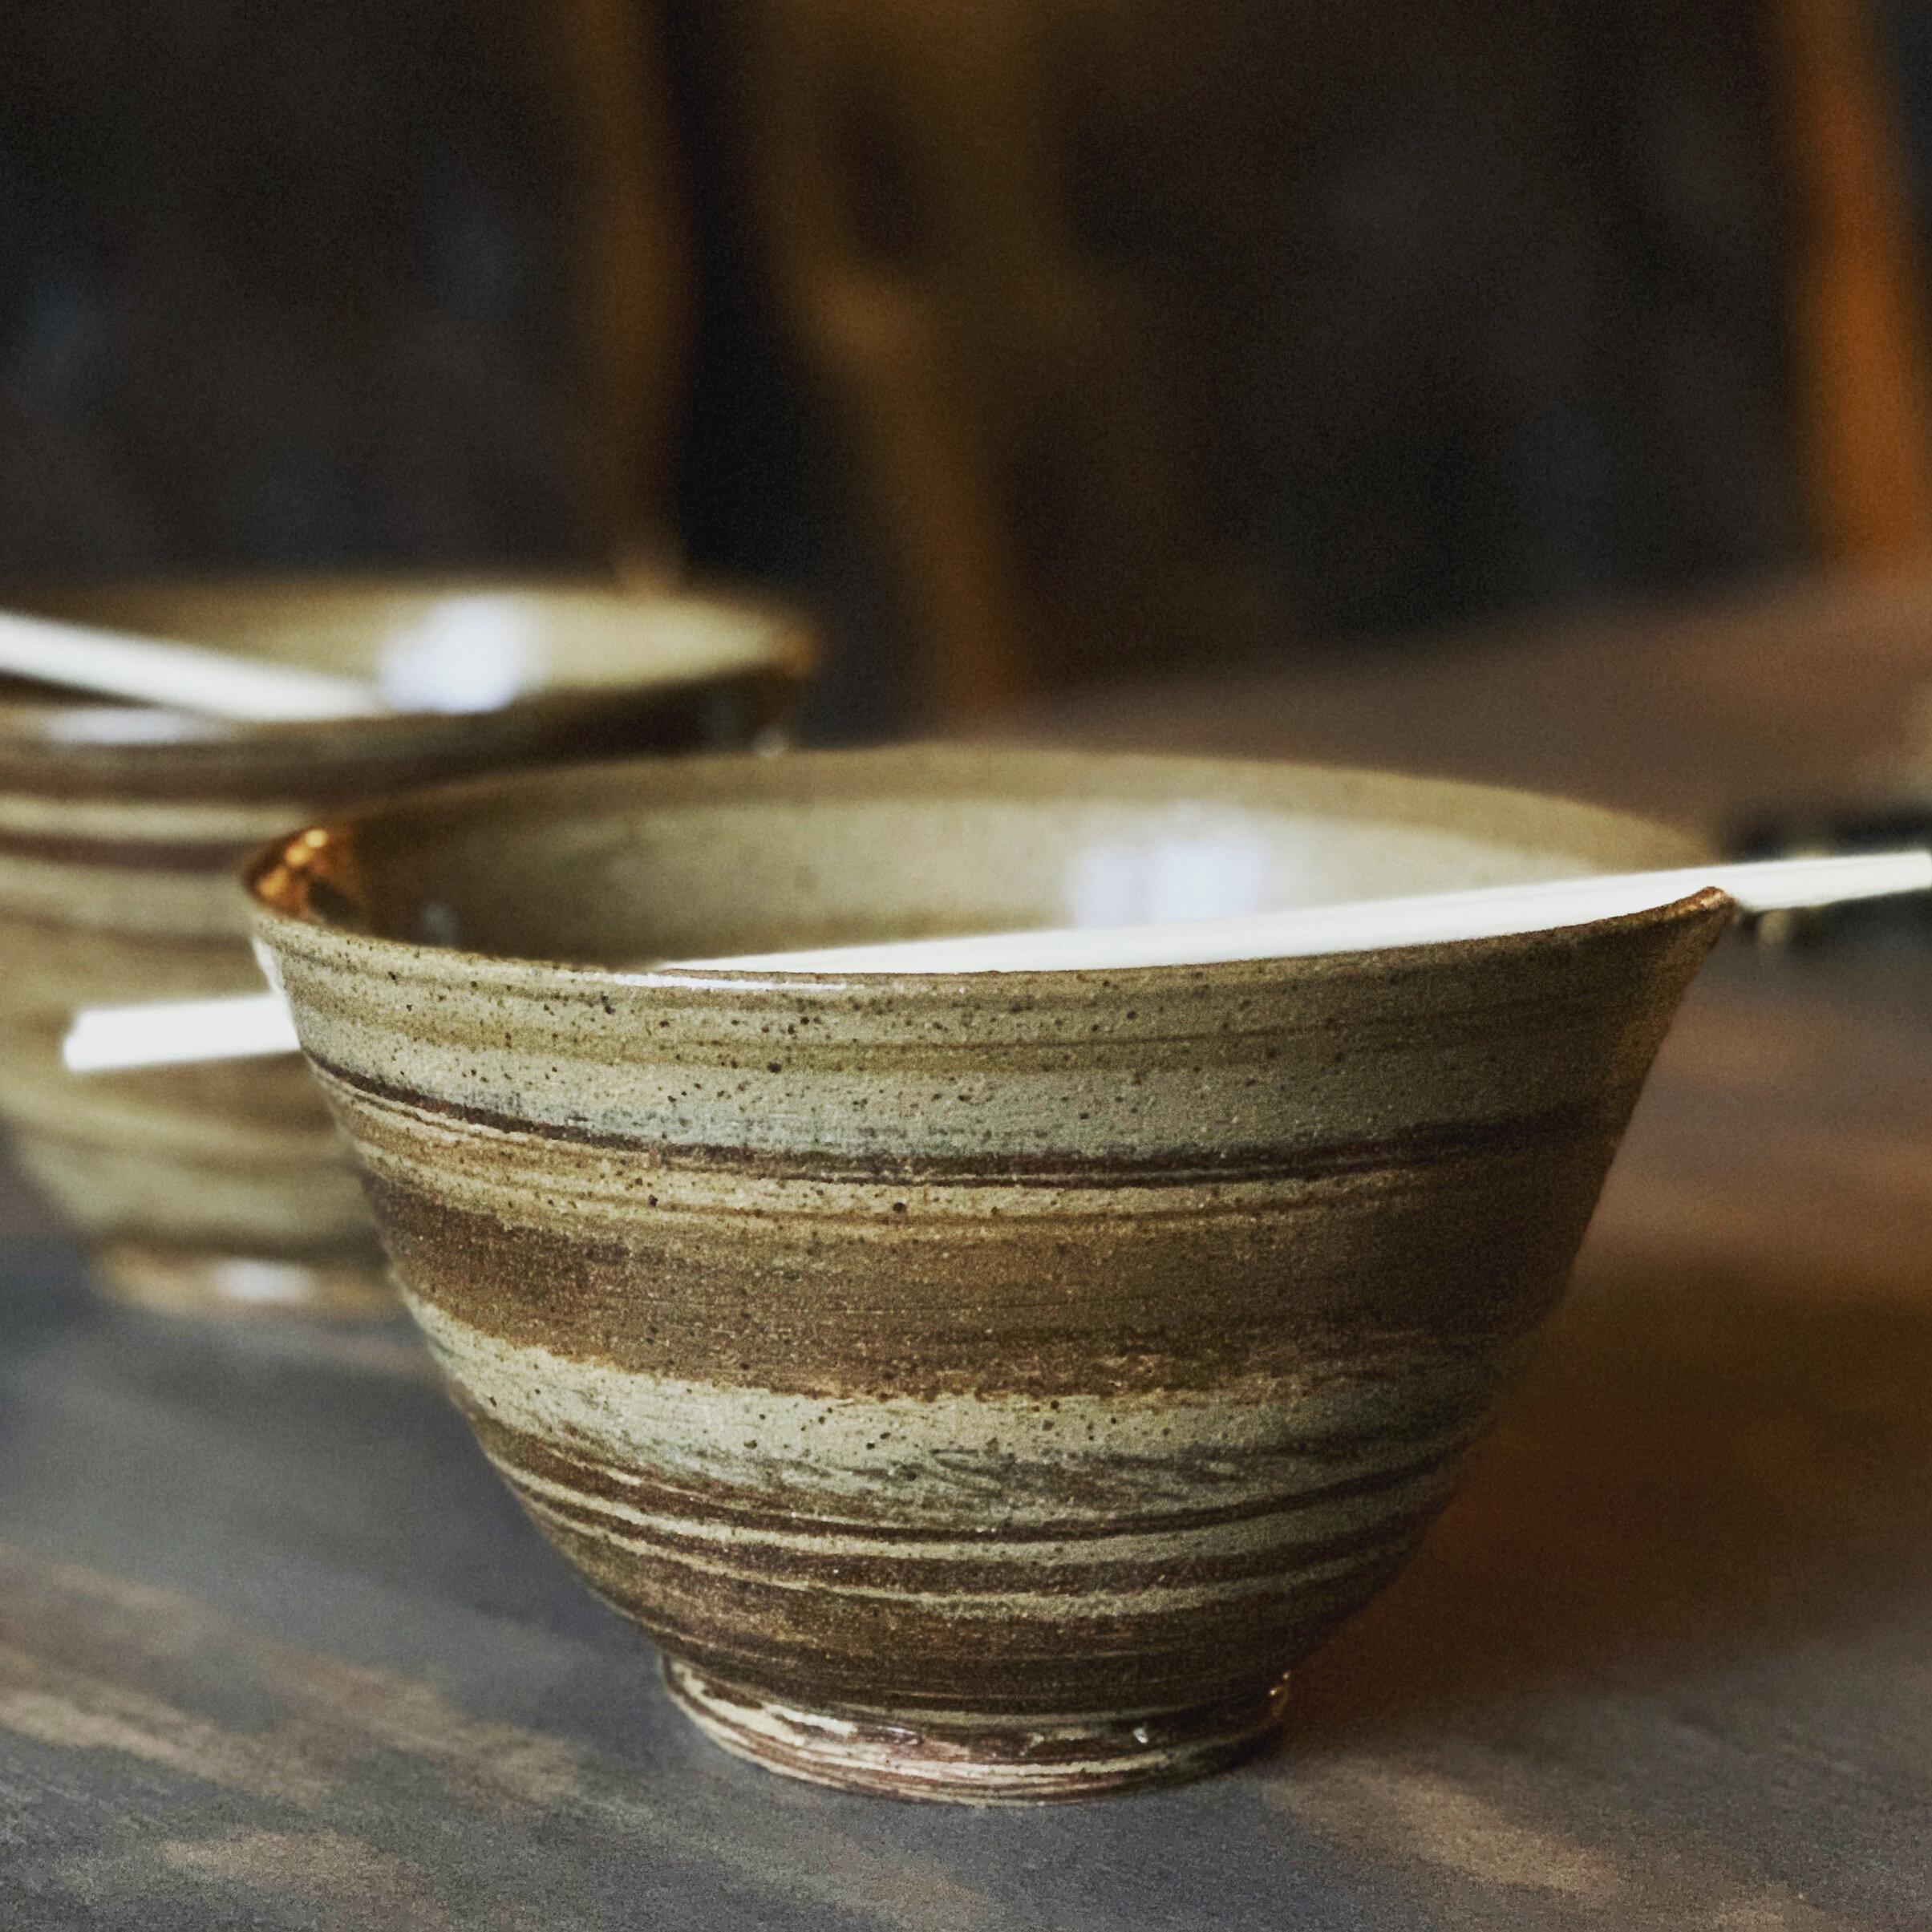 marbled ramen bowl.JPG